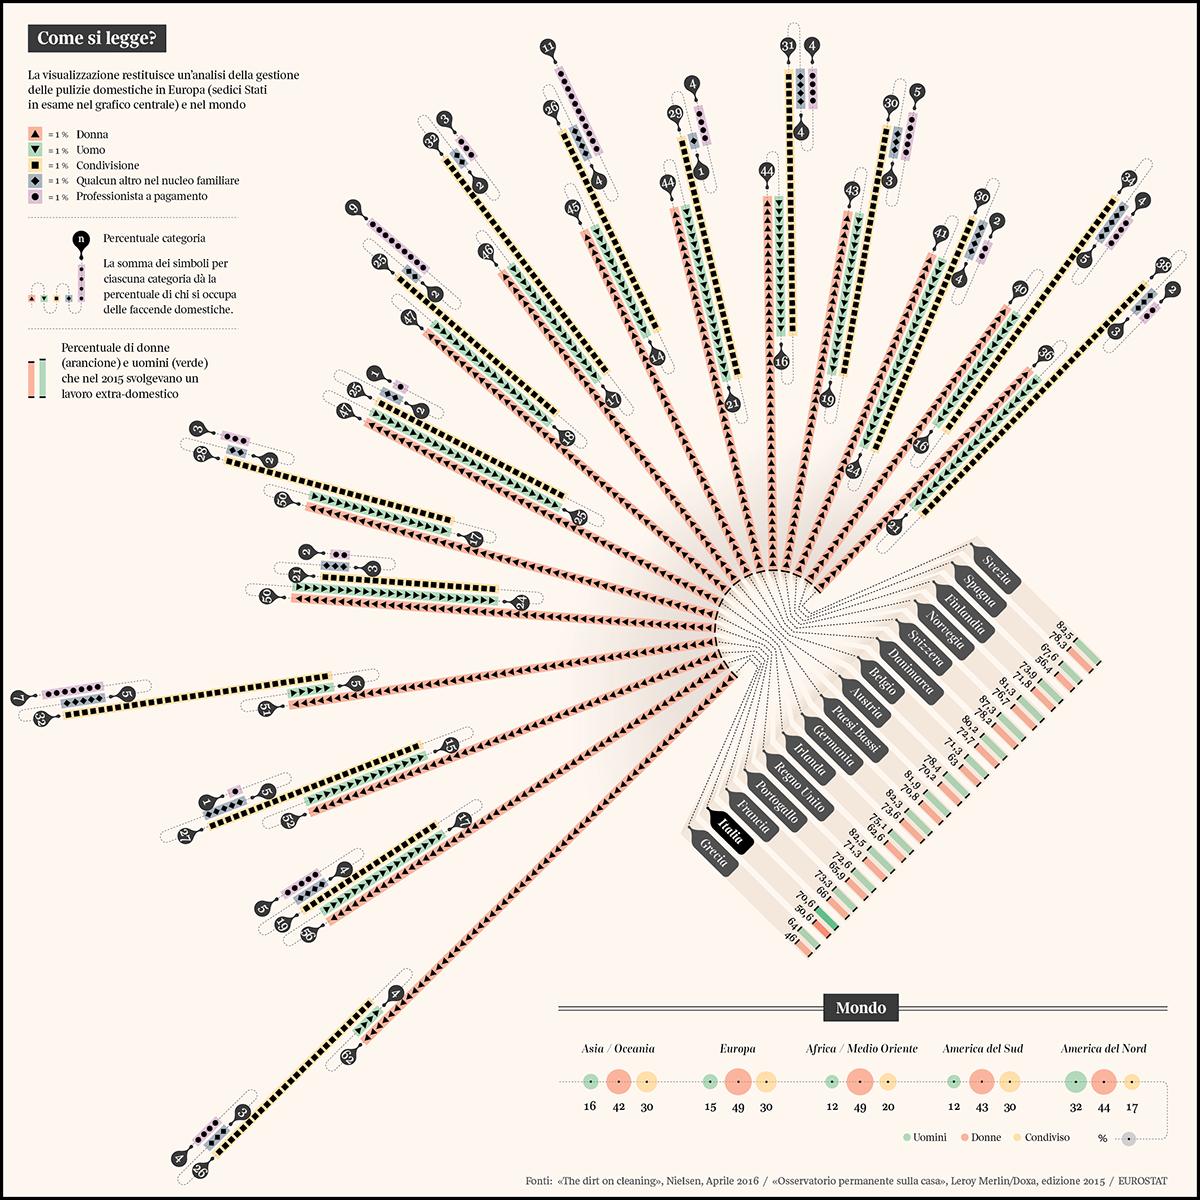 dataviz DATAVISUALIZATION infographic housecleaning homecleaning lalettura IlCorrieredellaSera